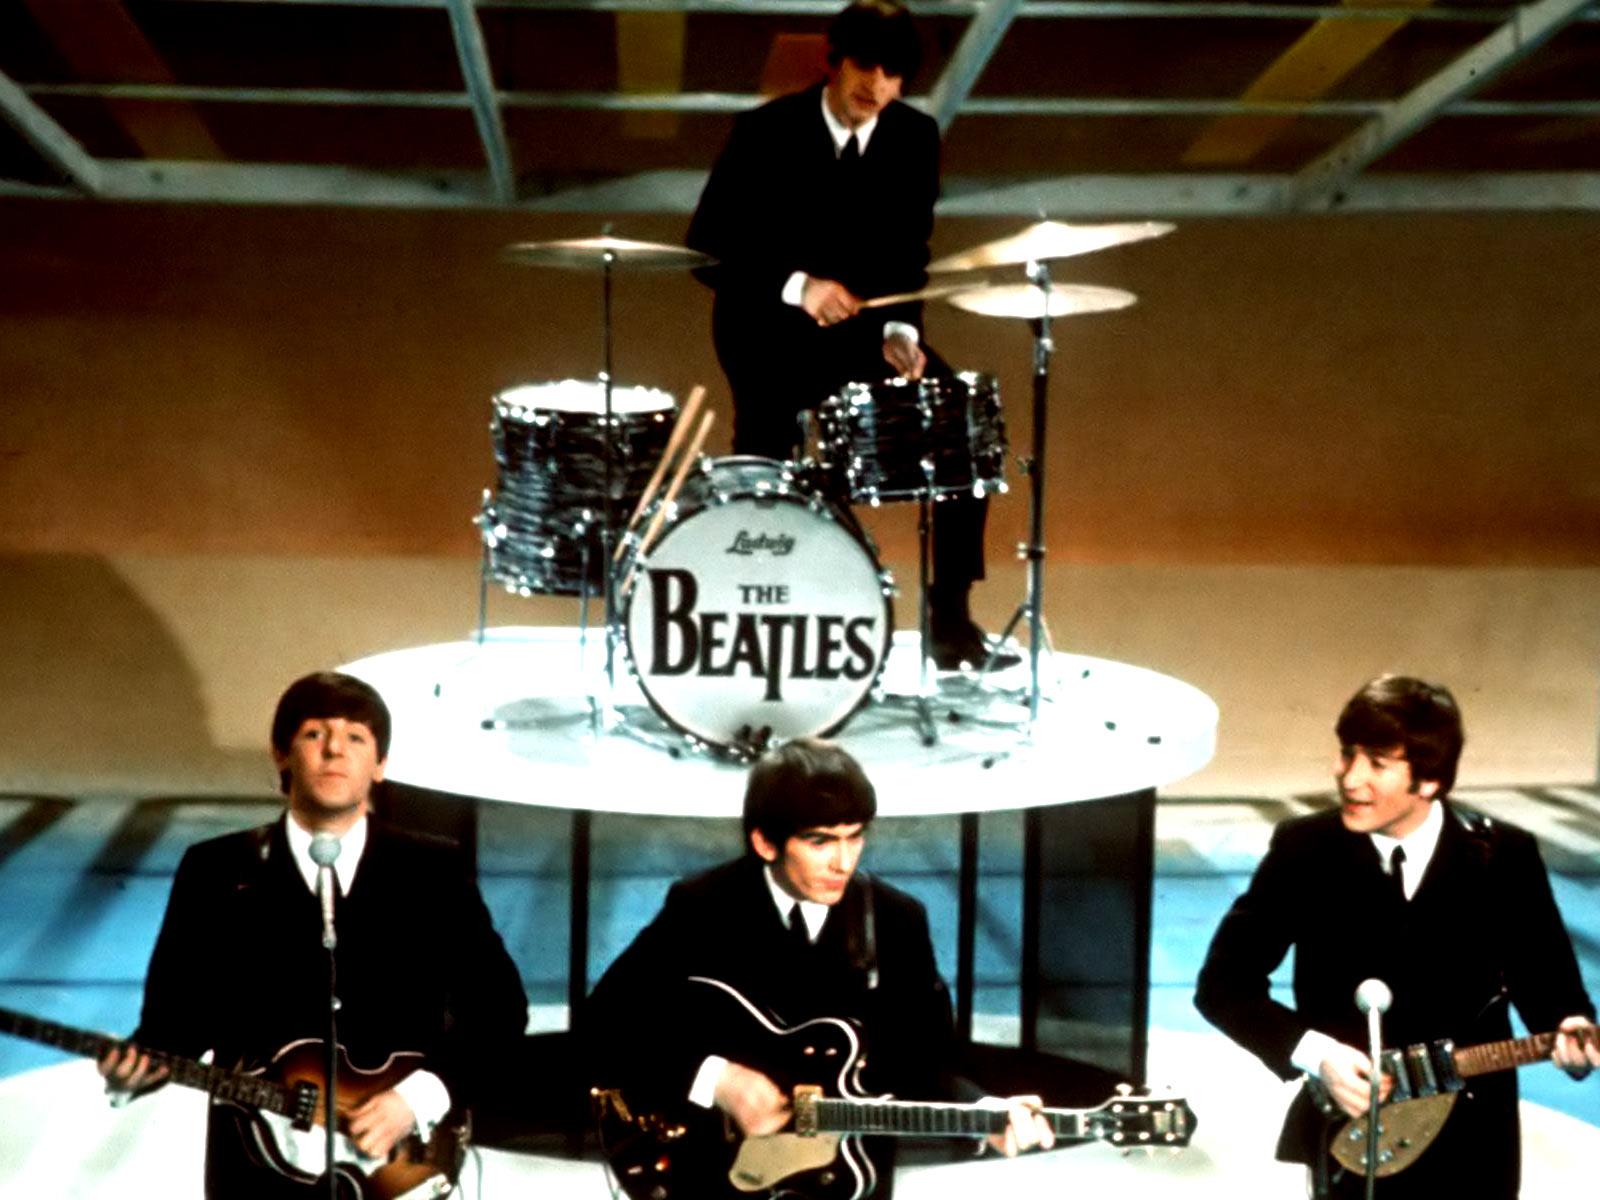 Top Wallpapers: The Beatles Wallpaper